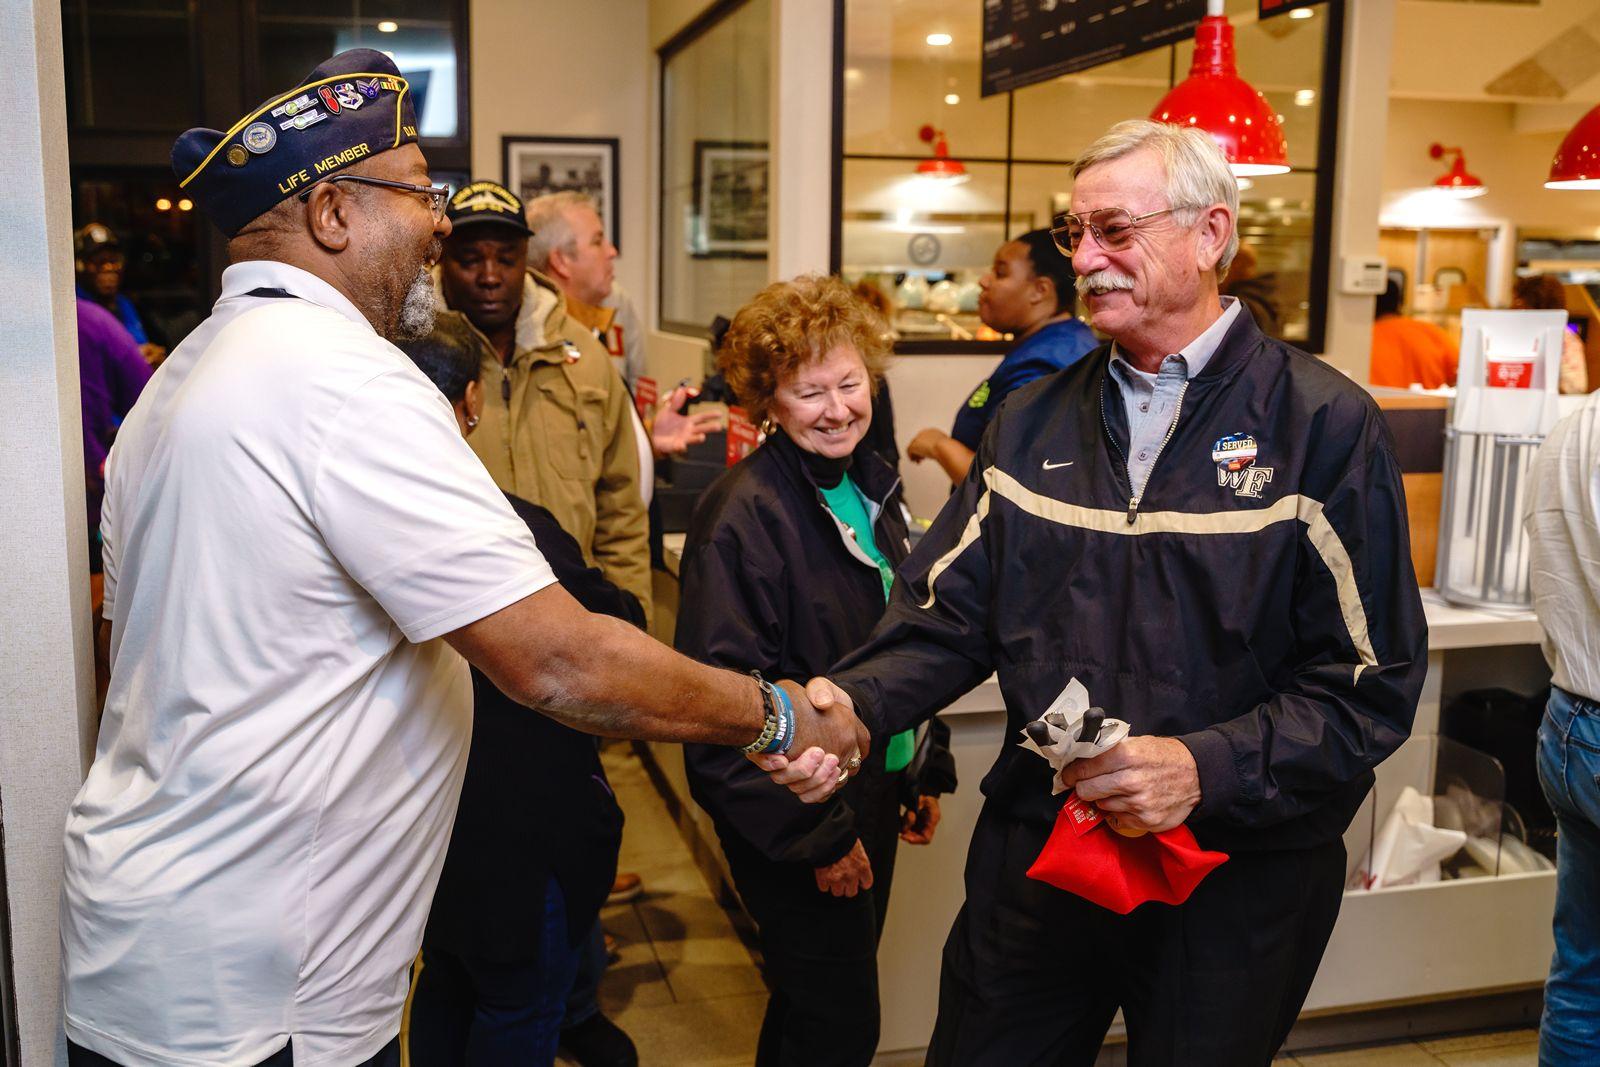 Golden Corral Raised More Than $1 Million for Disabled American Veterans